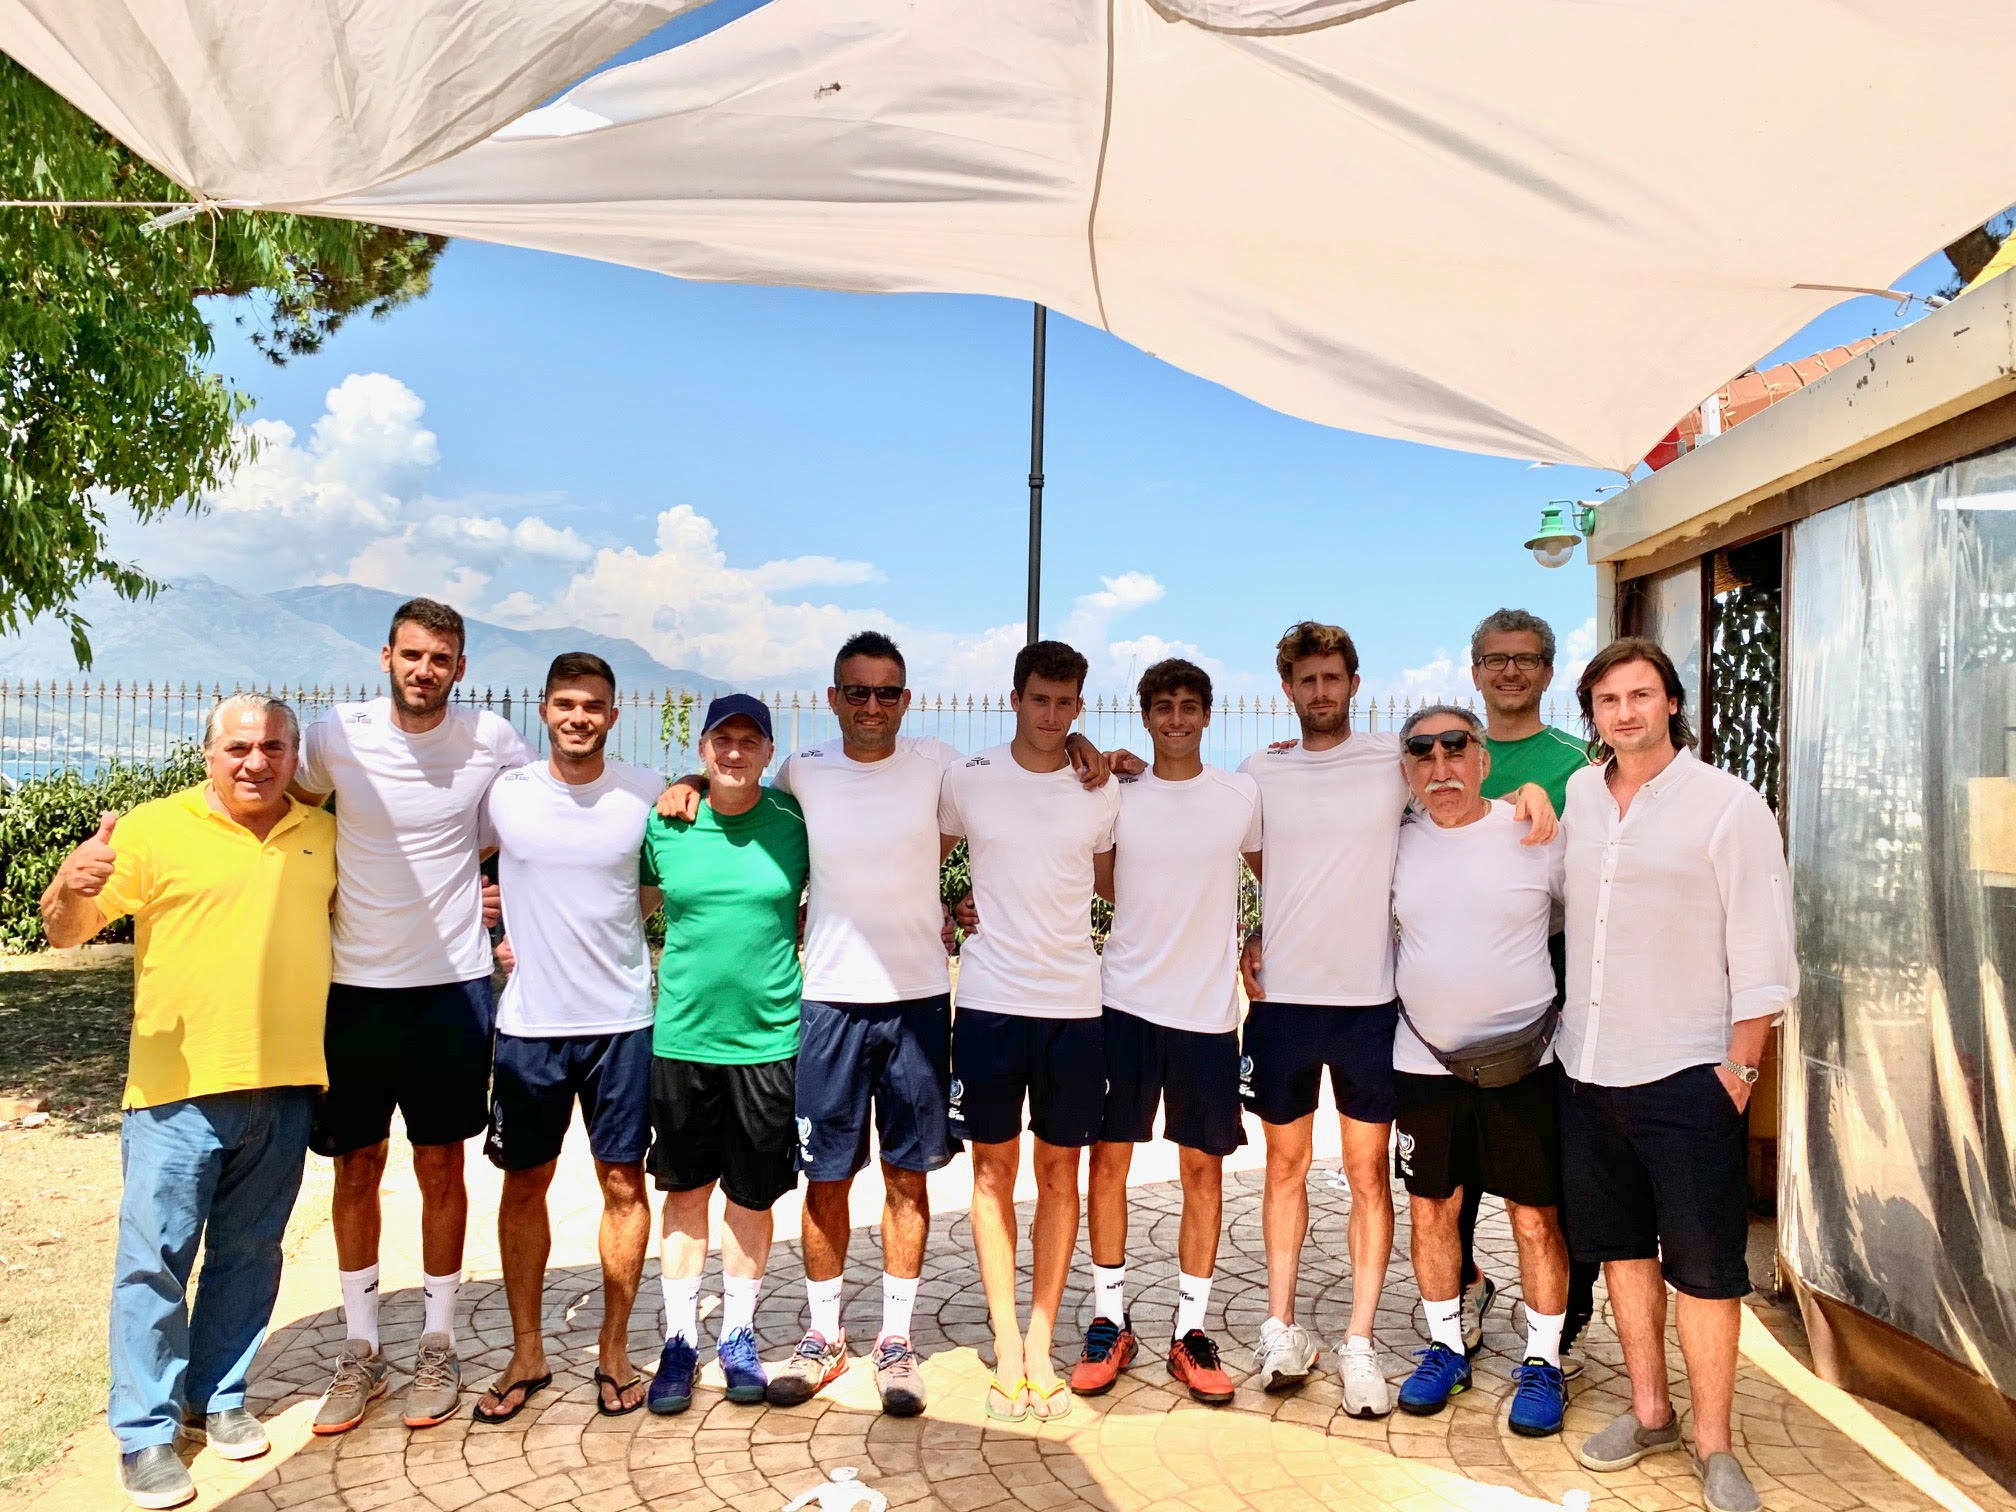 Tennis Team Avino San Giuseppe Vesuviano